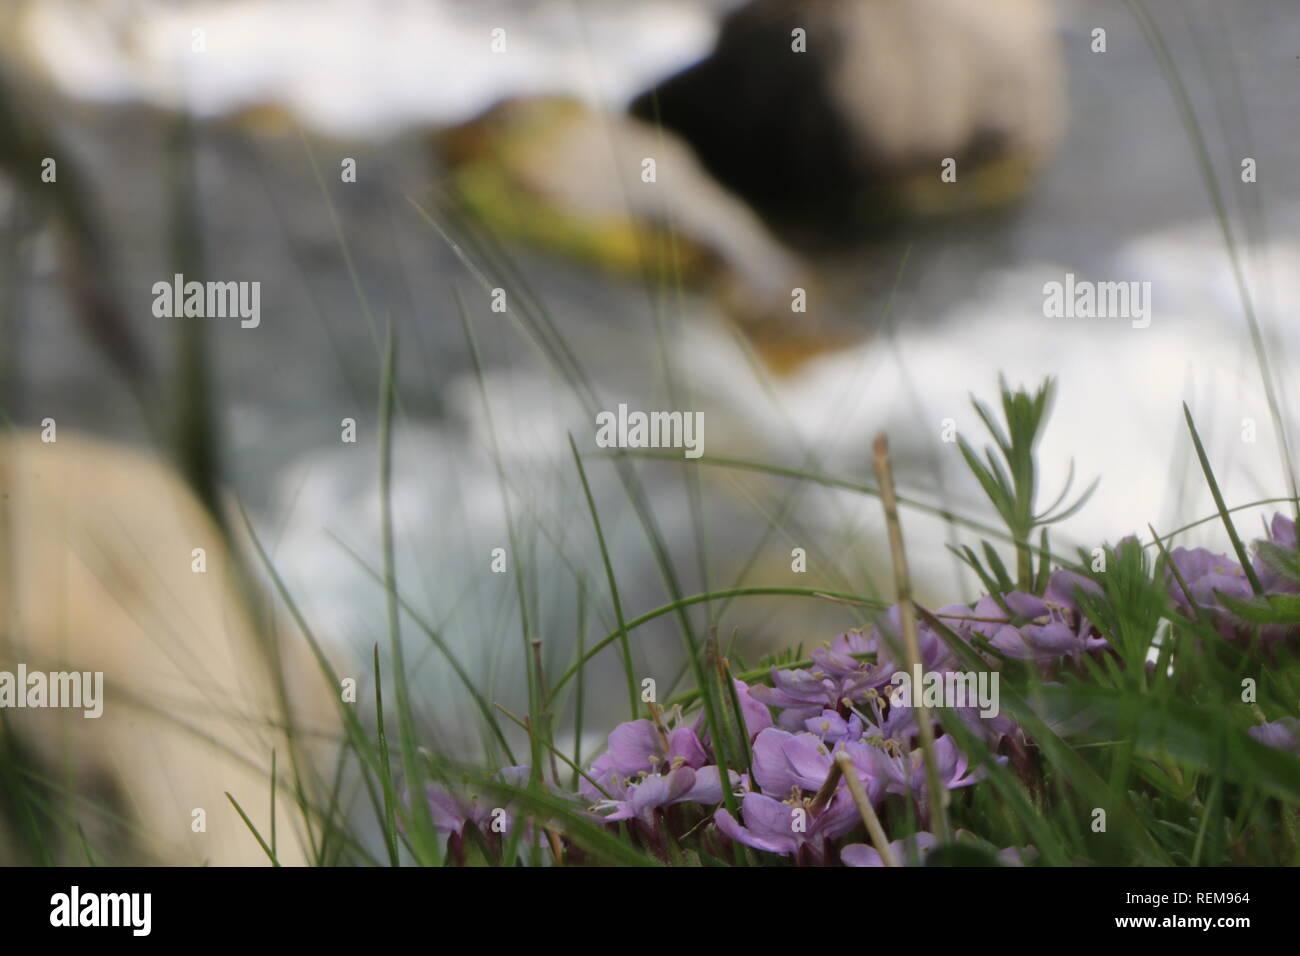 Lila Blumen am Wasserfall in Island - Stock Image